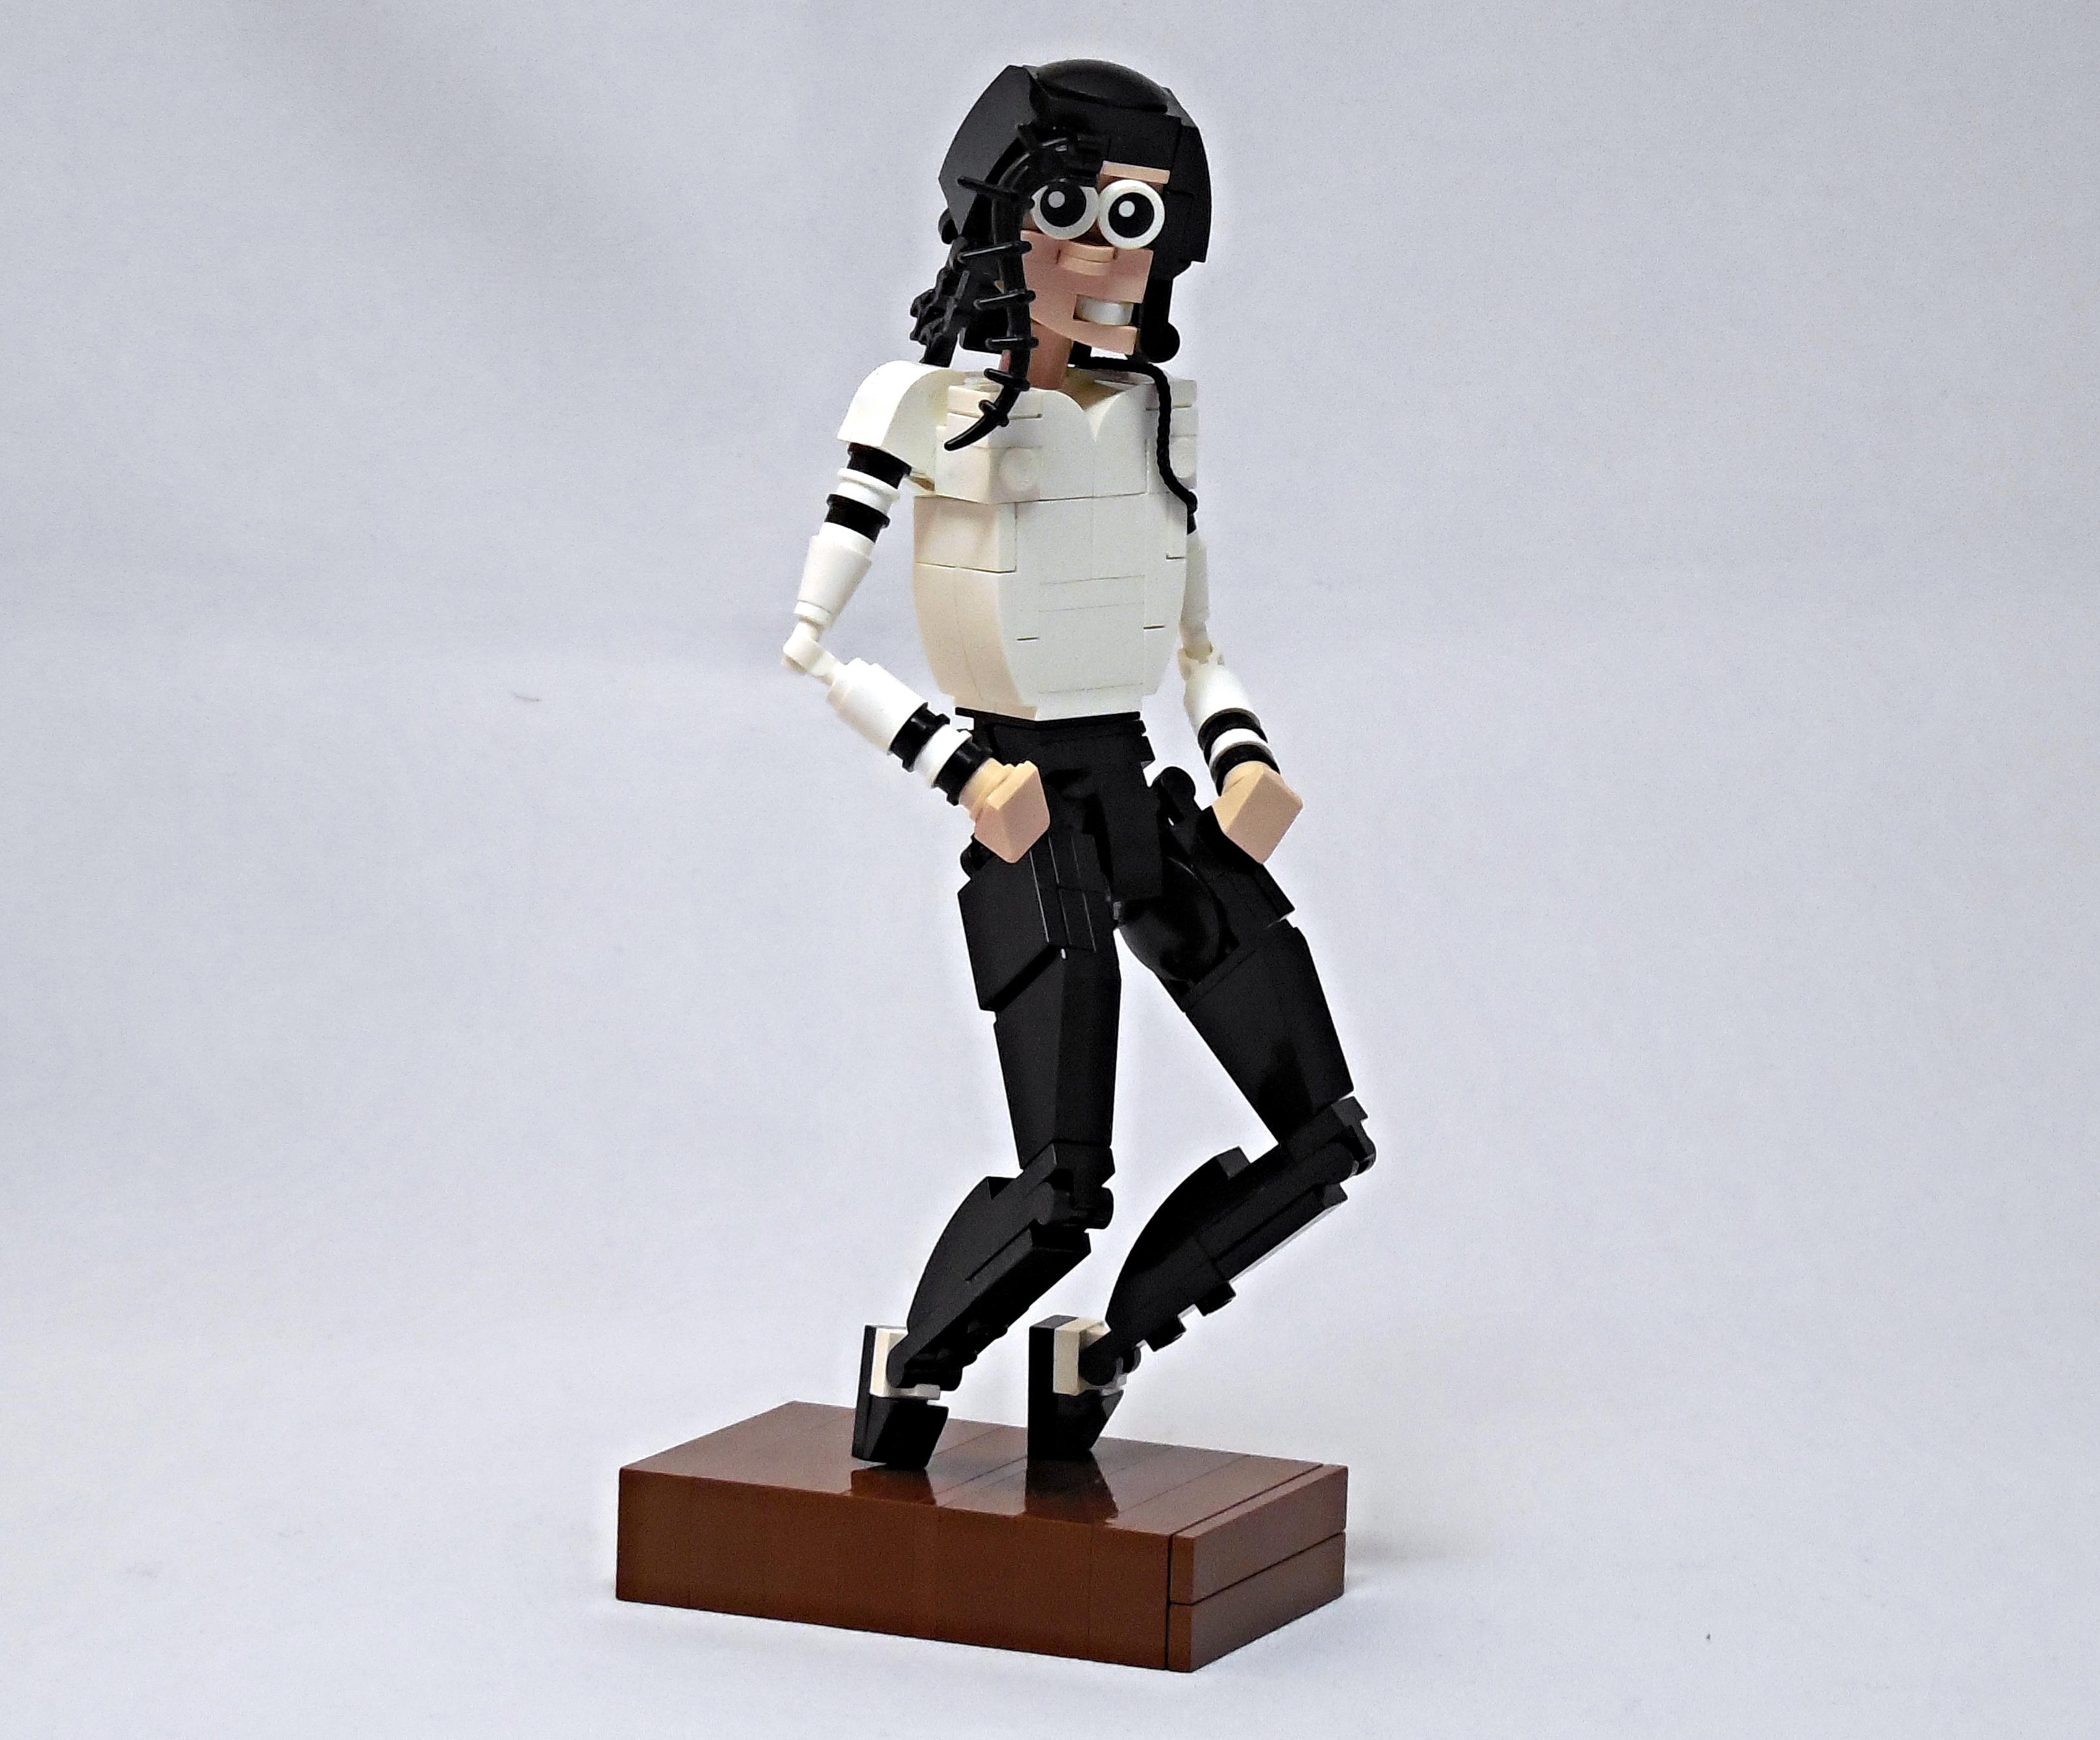 LEGO® MOC by Vitreolum: Michael Jackson